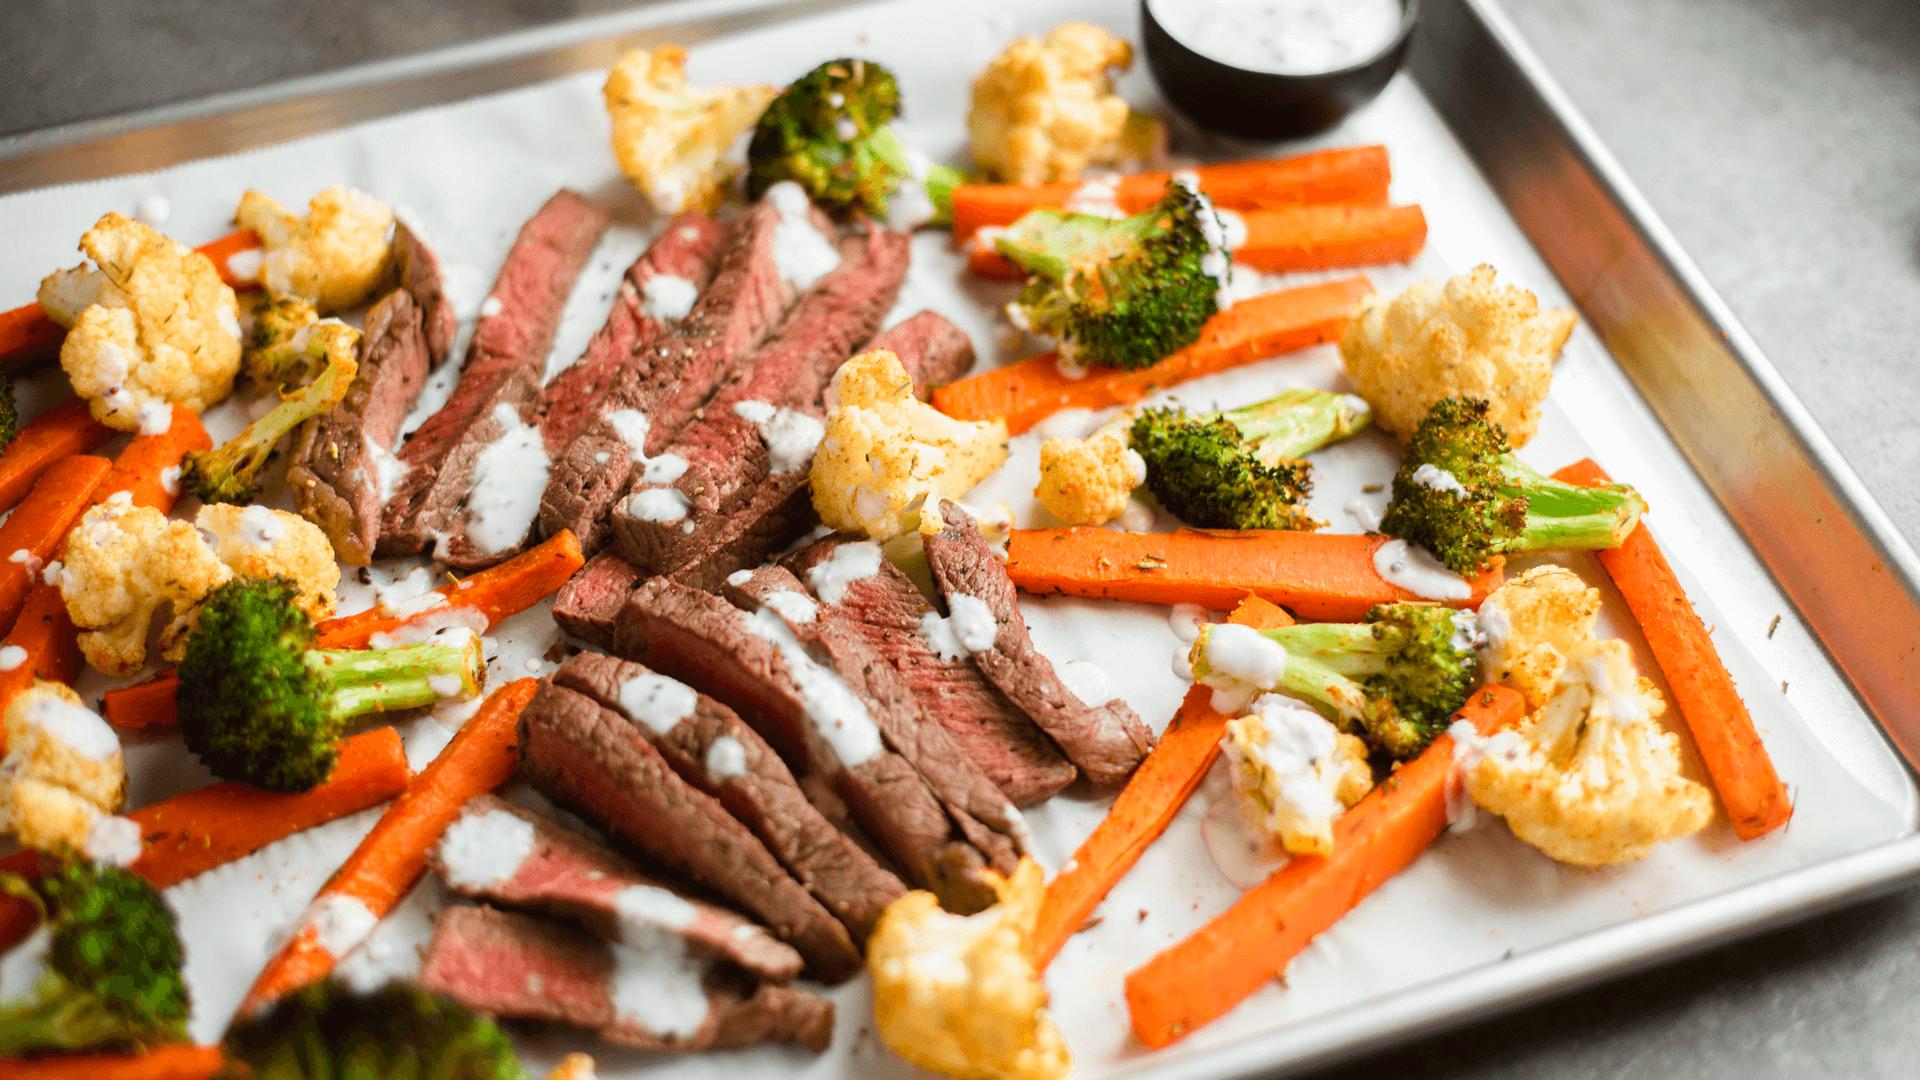 Steak and roasted vegetable sheet-pan dinner